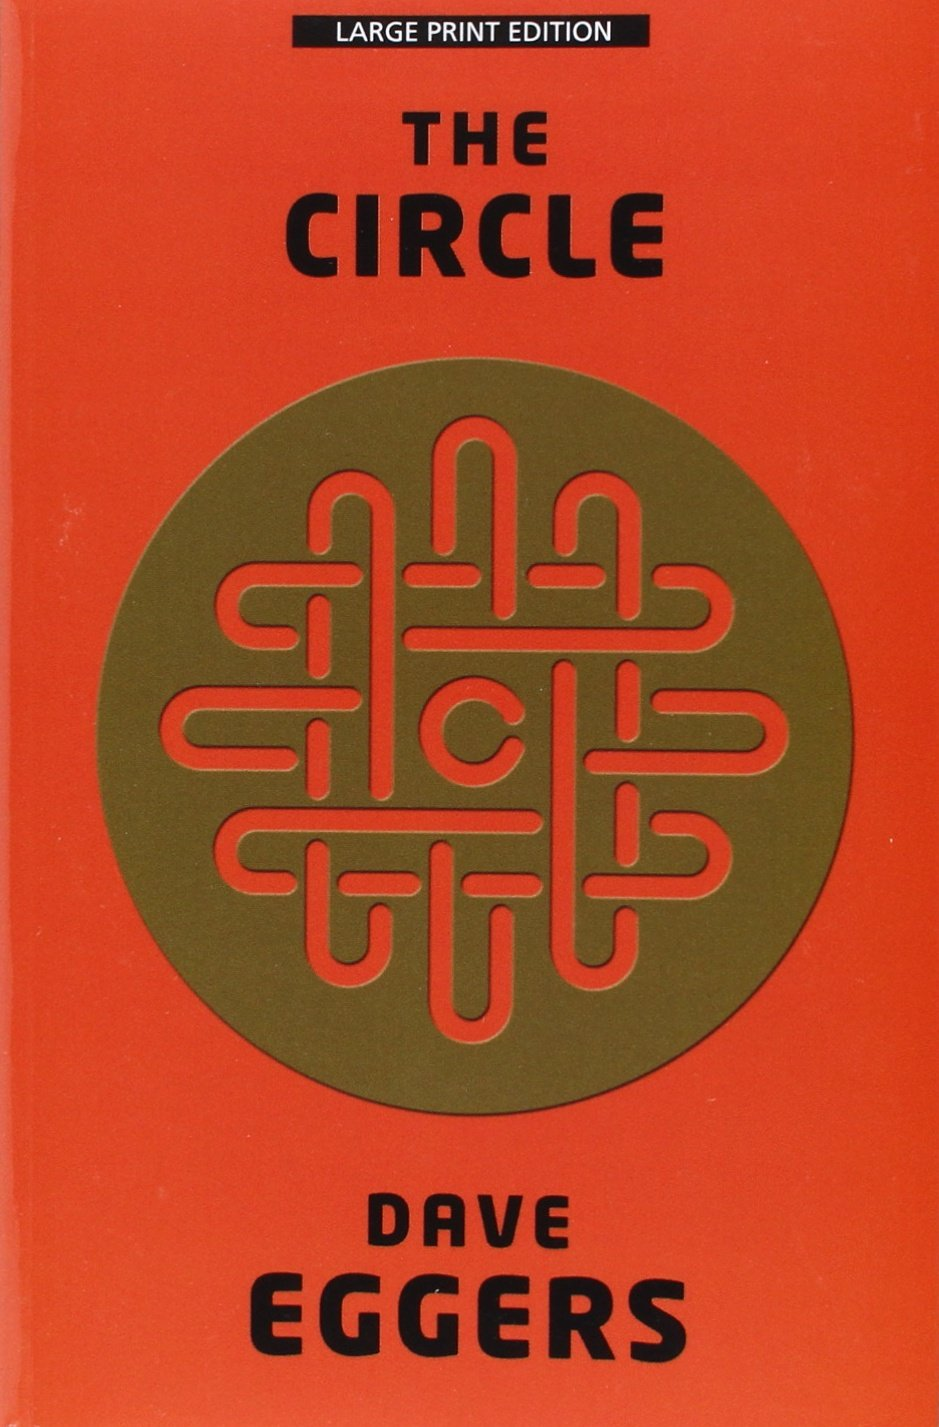 The circle dave eggers 9781594139611 amazon books fandeluxe Choice Image